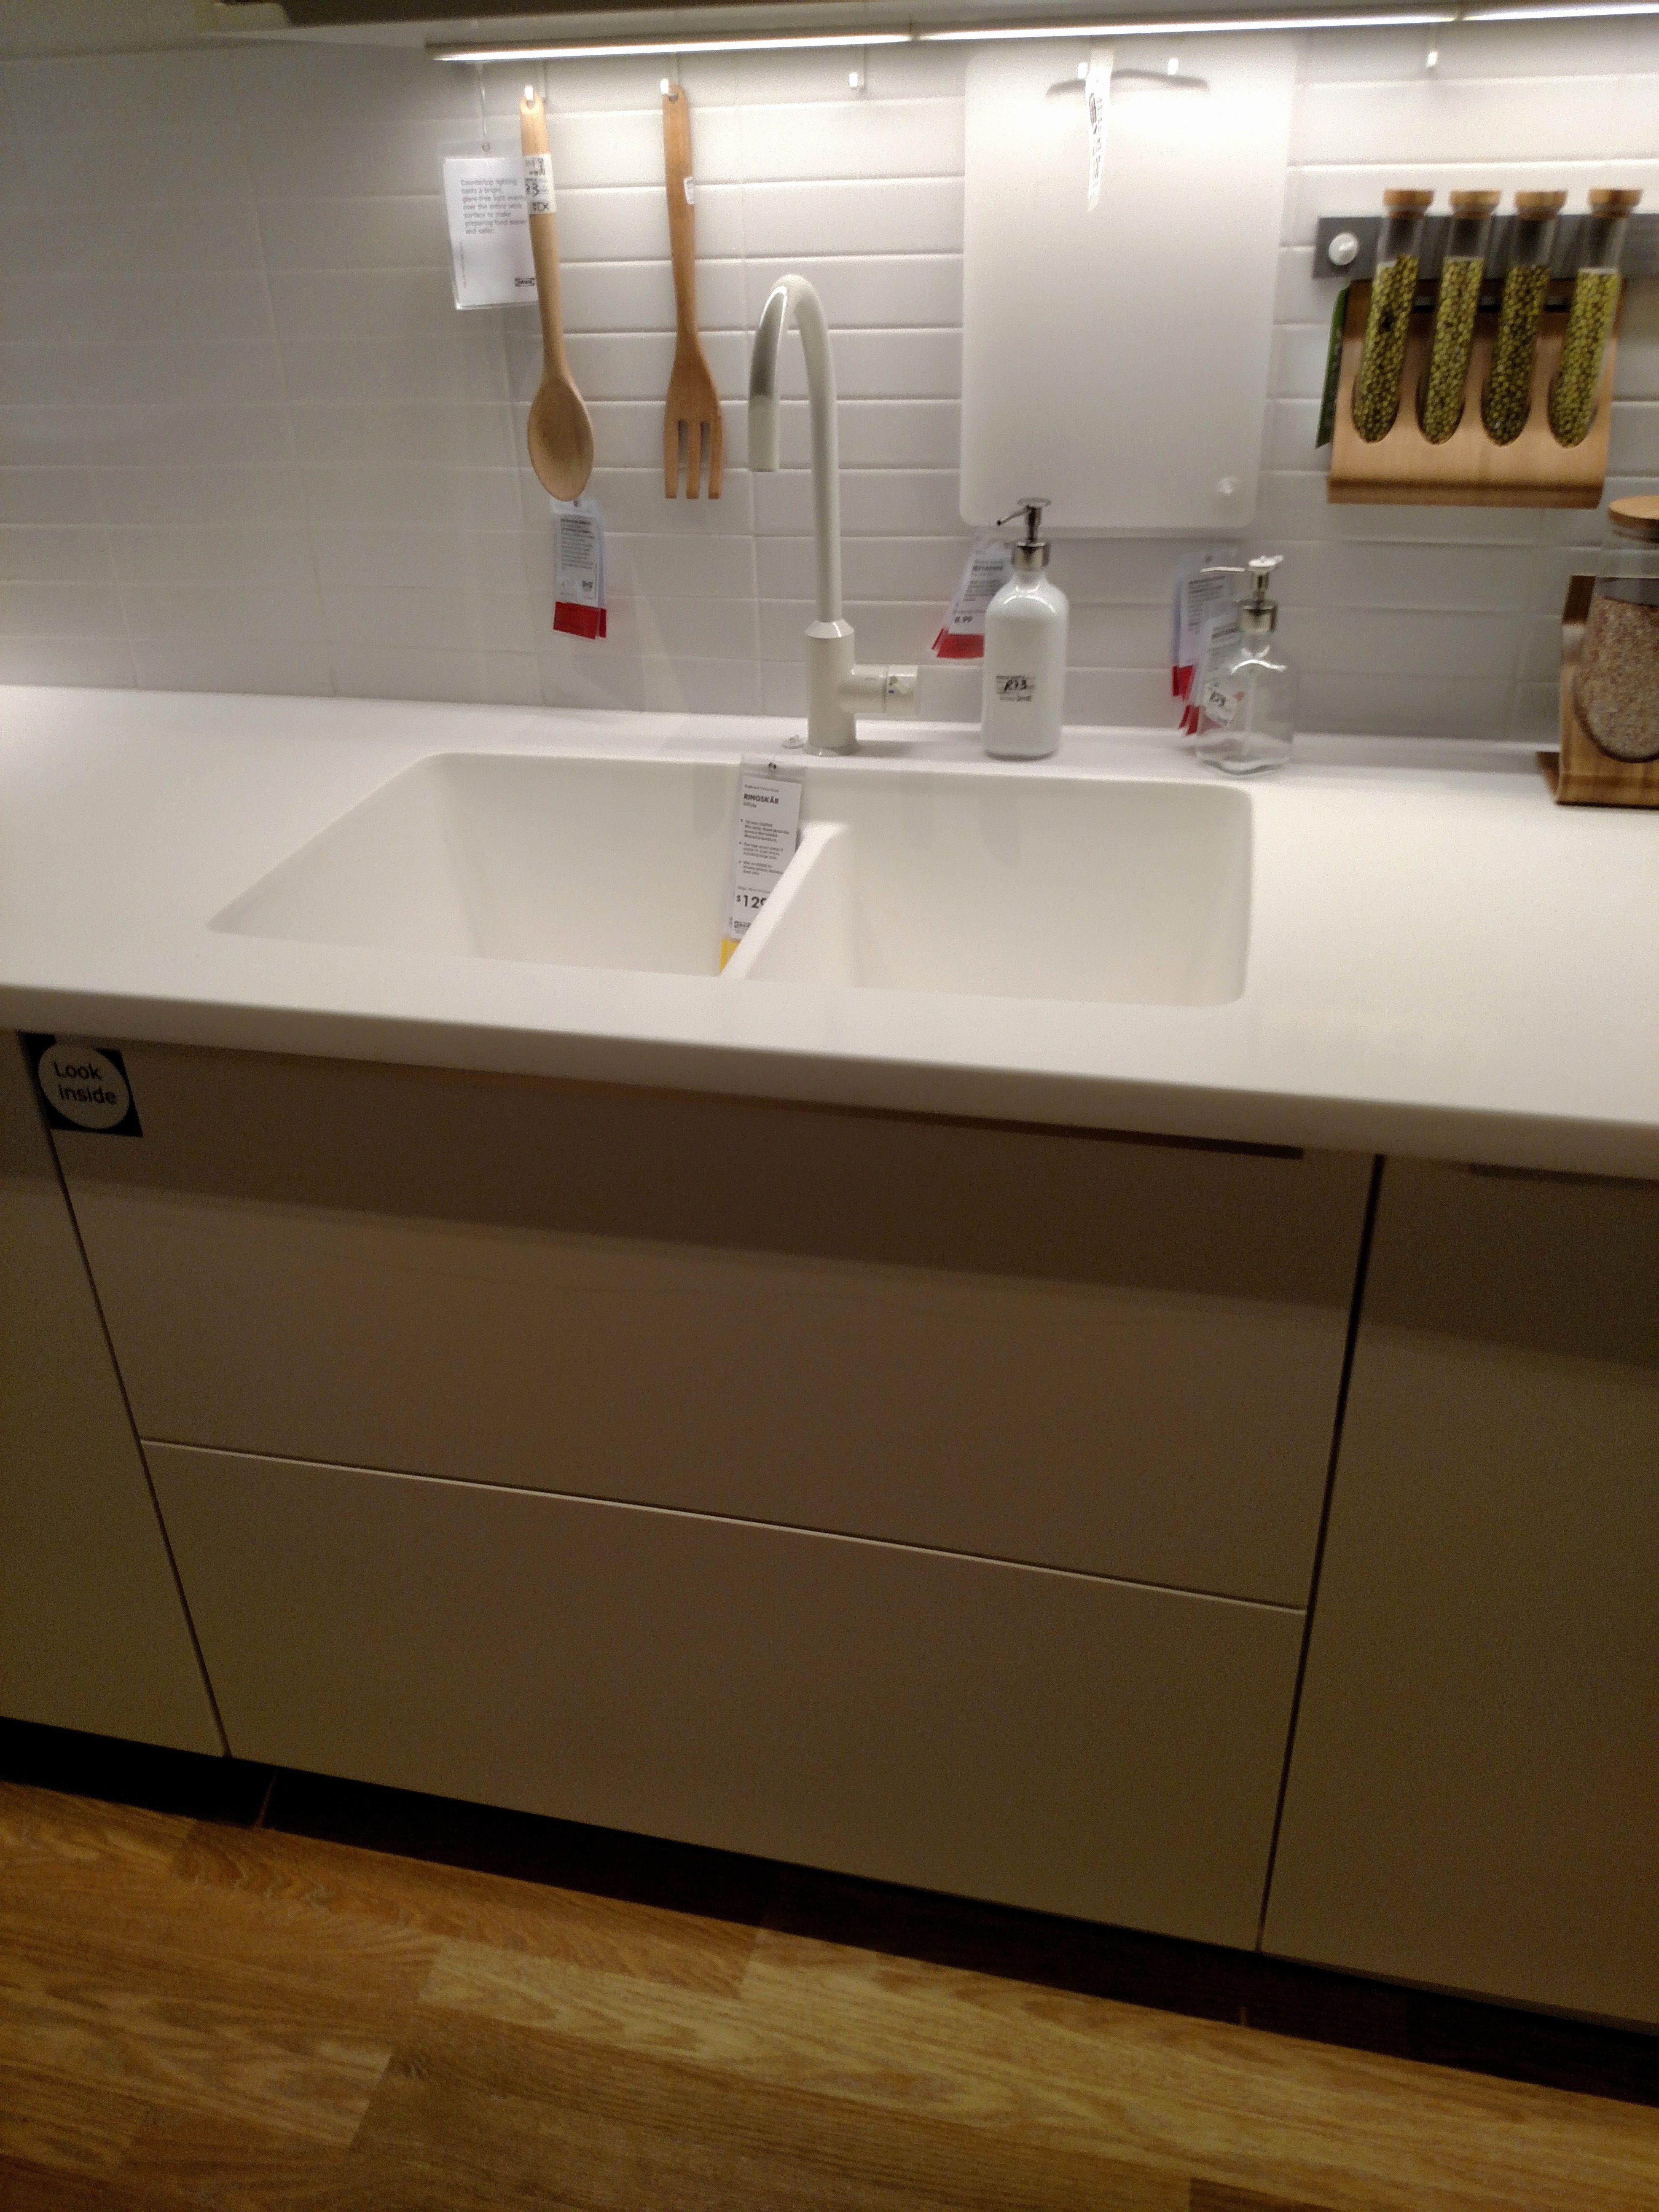 New Ikea Kitchen Cabinet Doors Kitchen Wall Cabinets Ikea Kitchen Cabinets Ikea Sinks